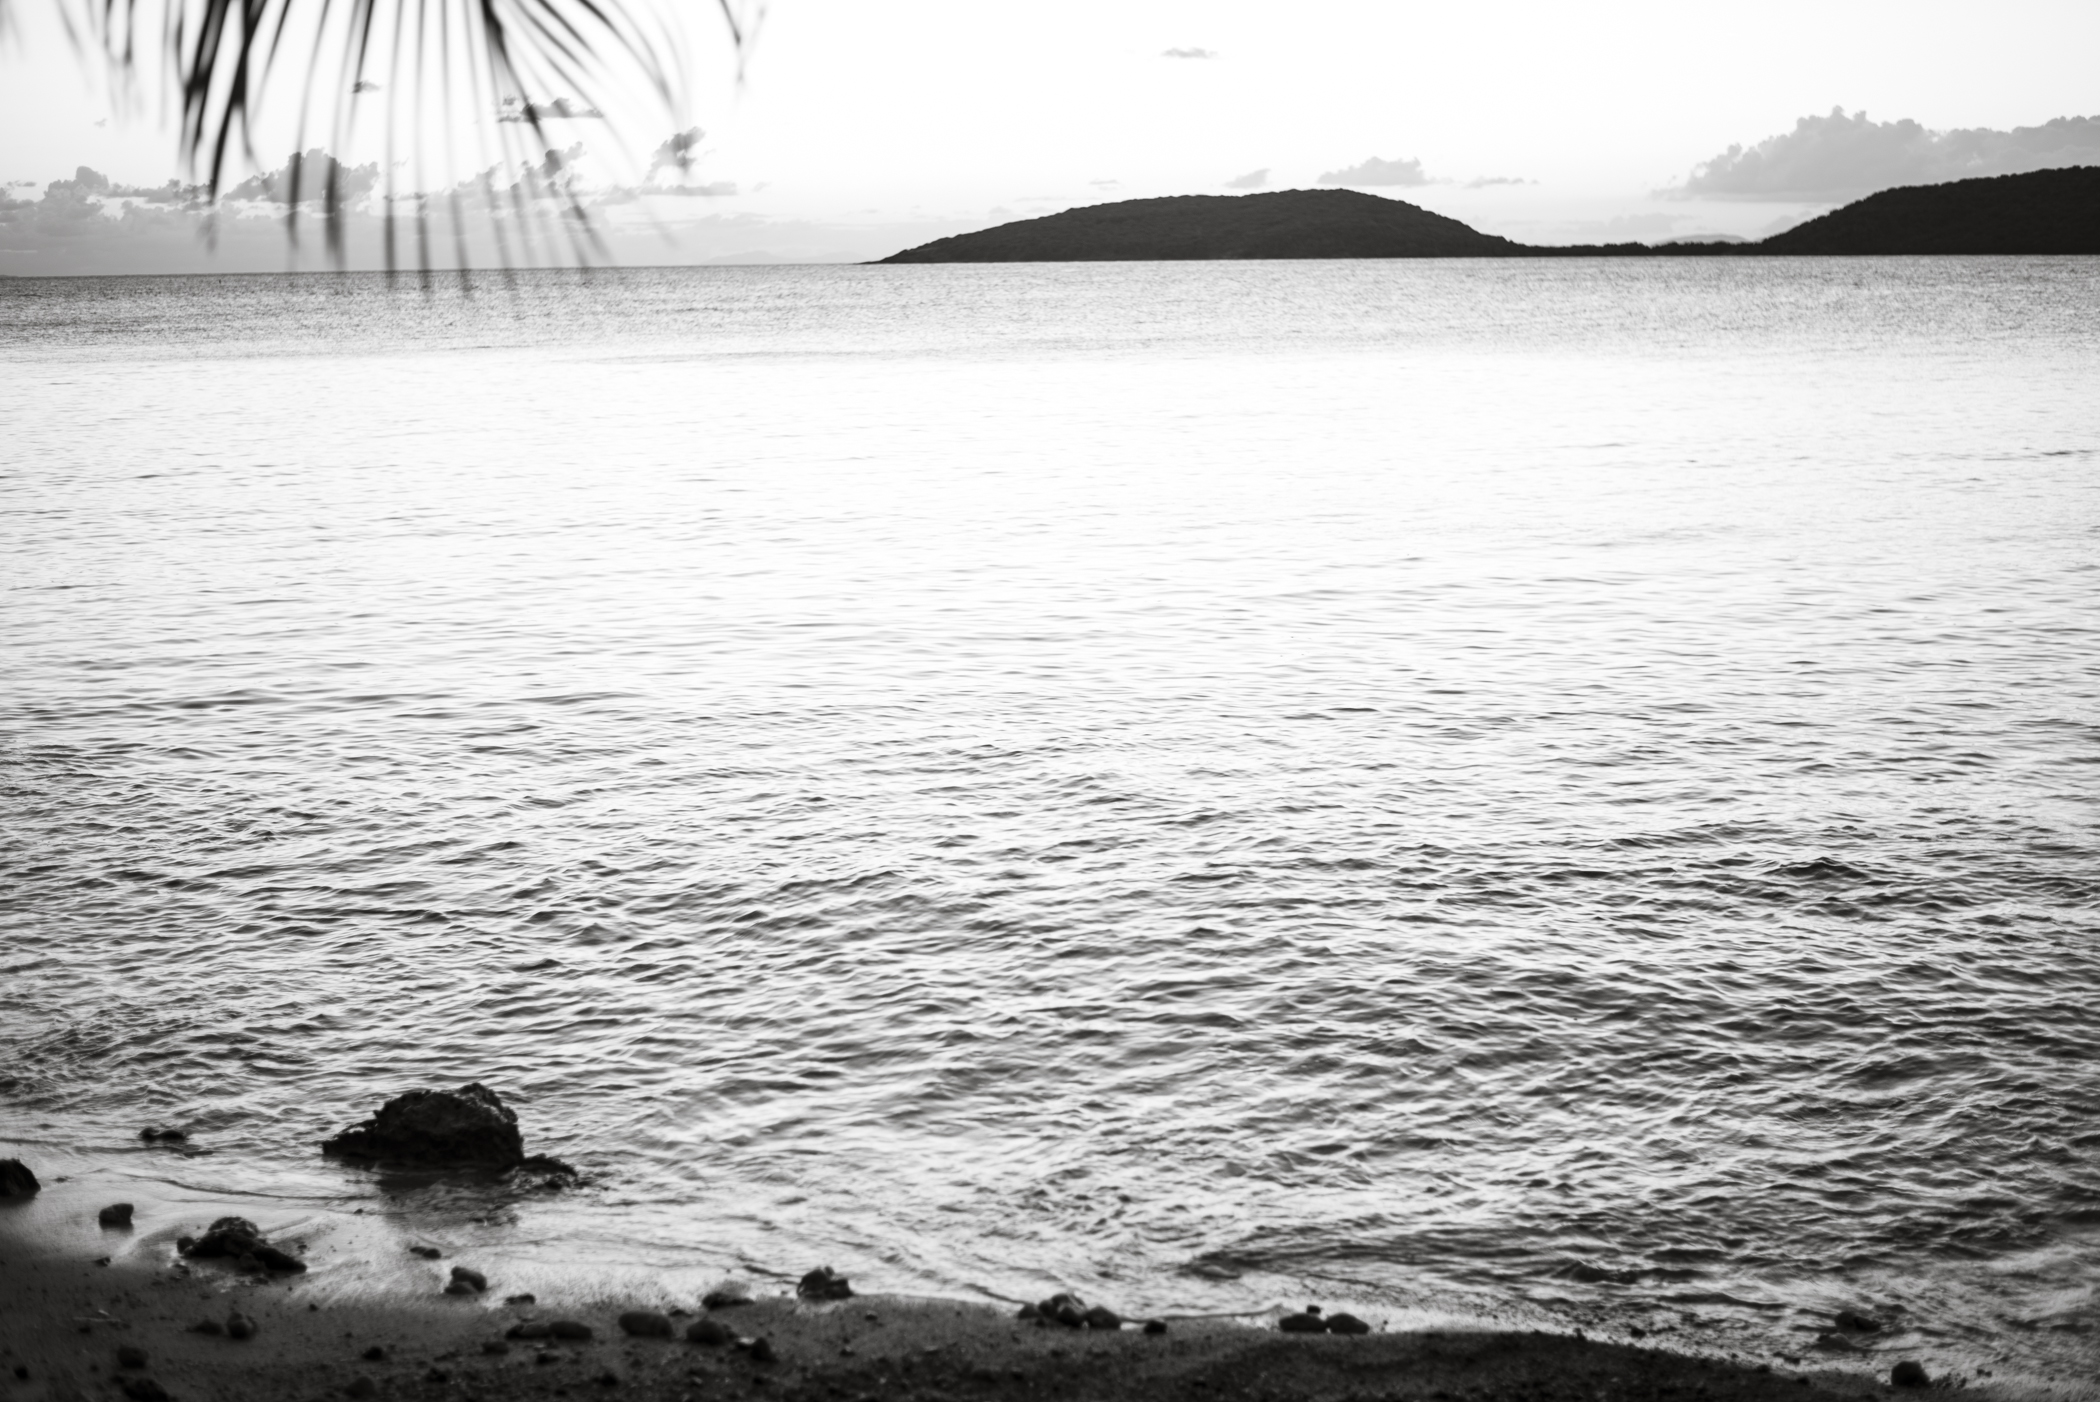 012014-Culebra-JuliaLuckettPhotography-37